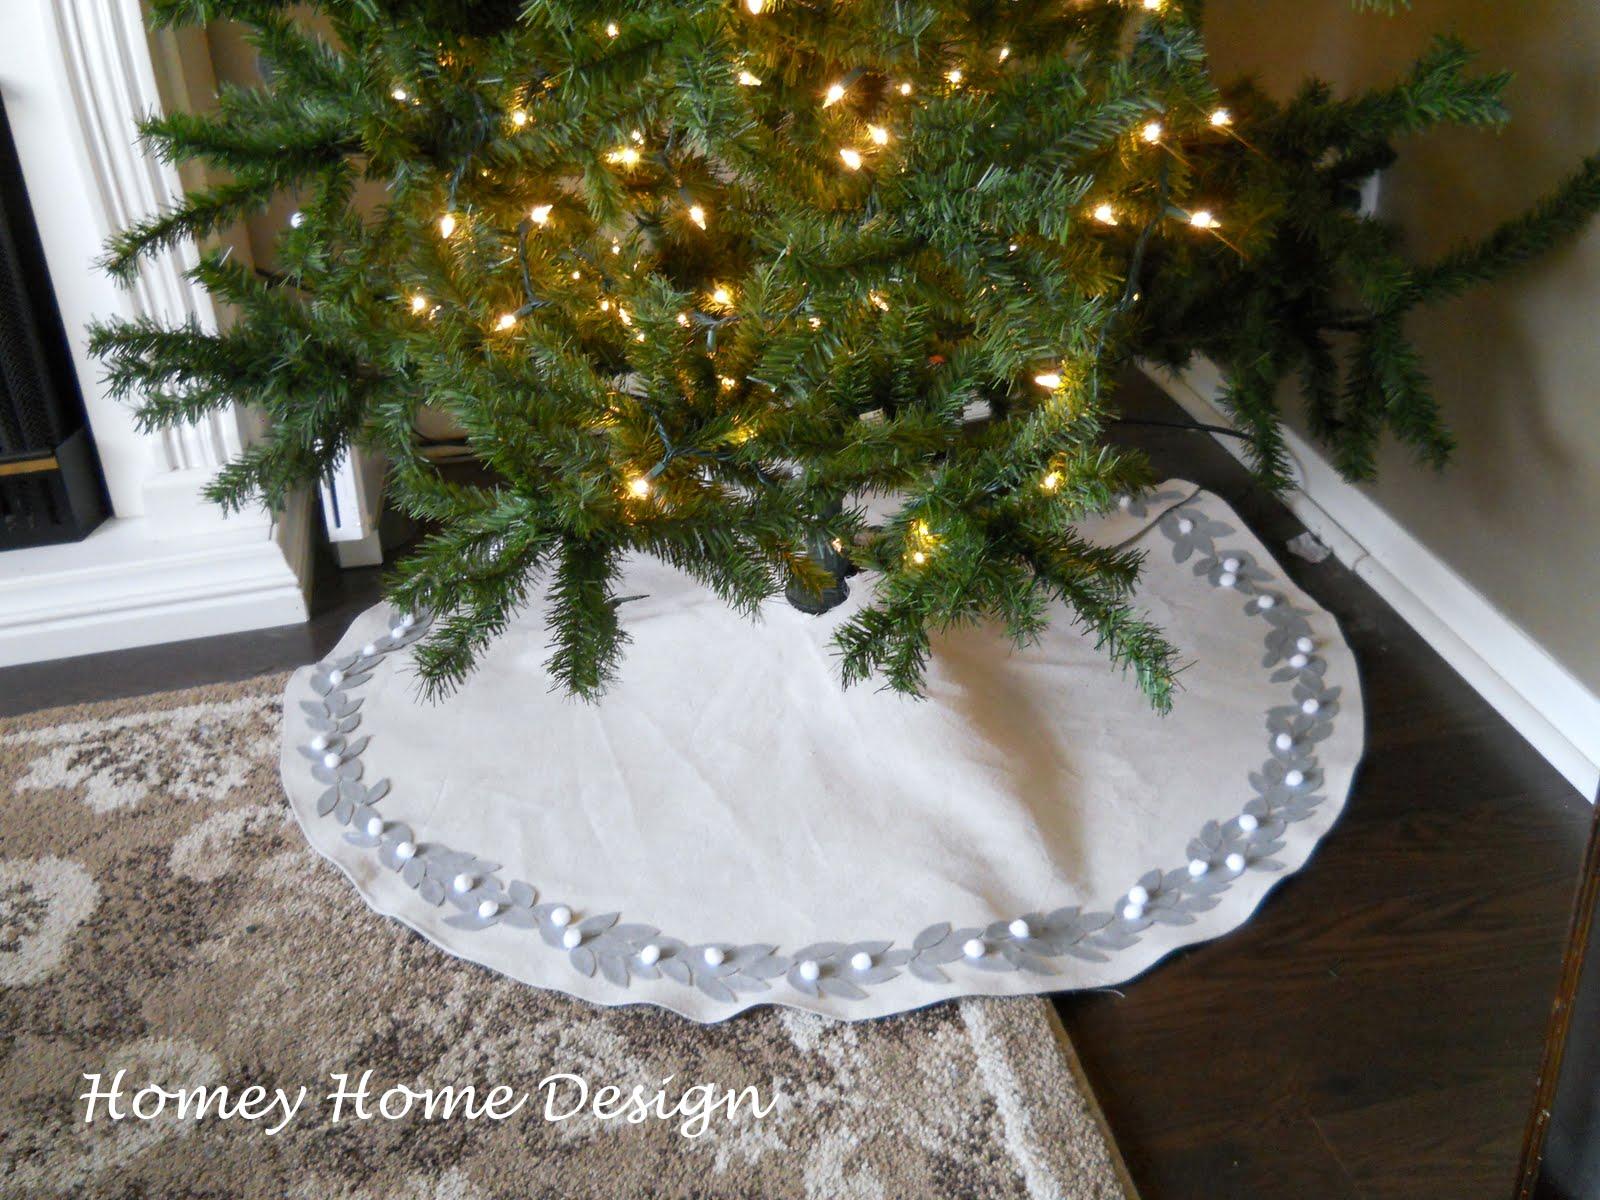 Homey home design christmas tree skirt tutorial